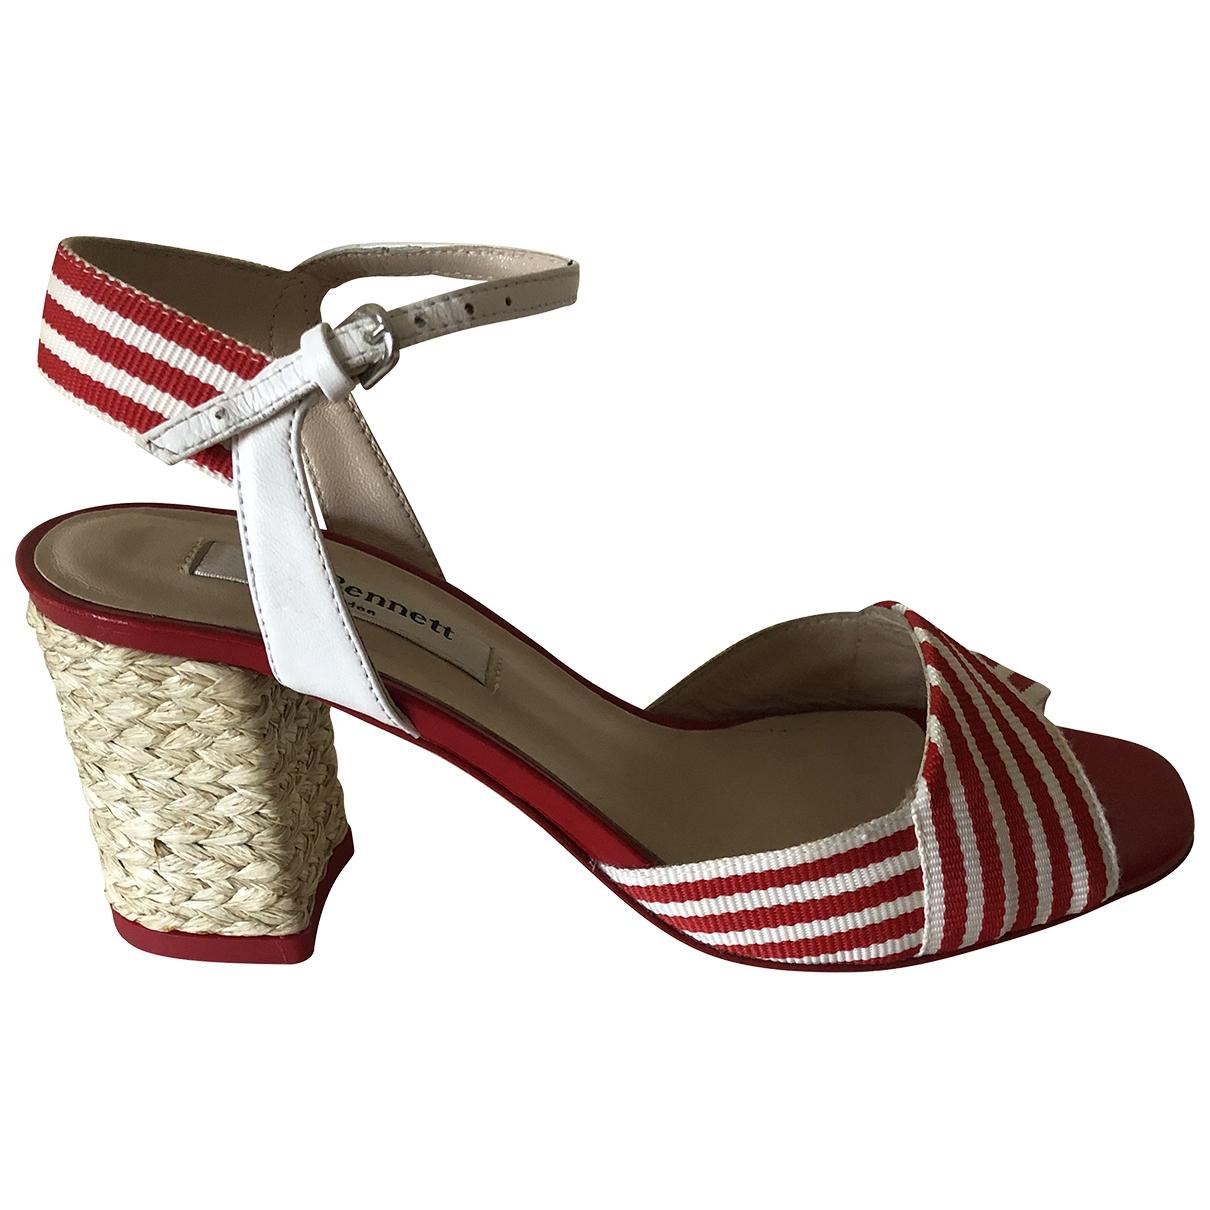 Lk Bennett - Sandales   pour femme en toile - rouge